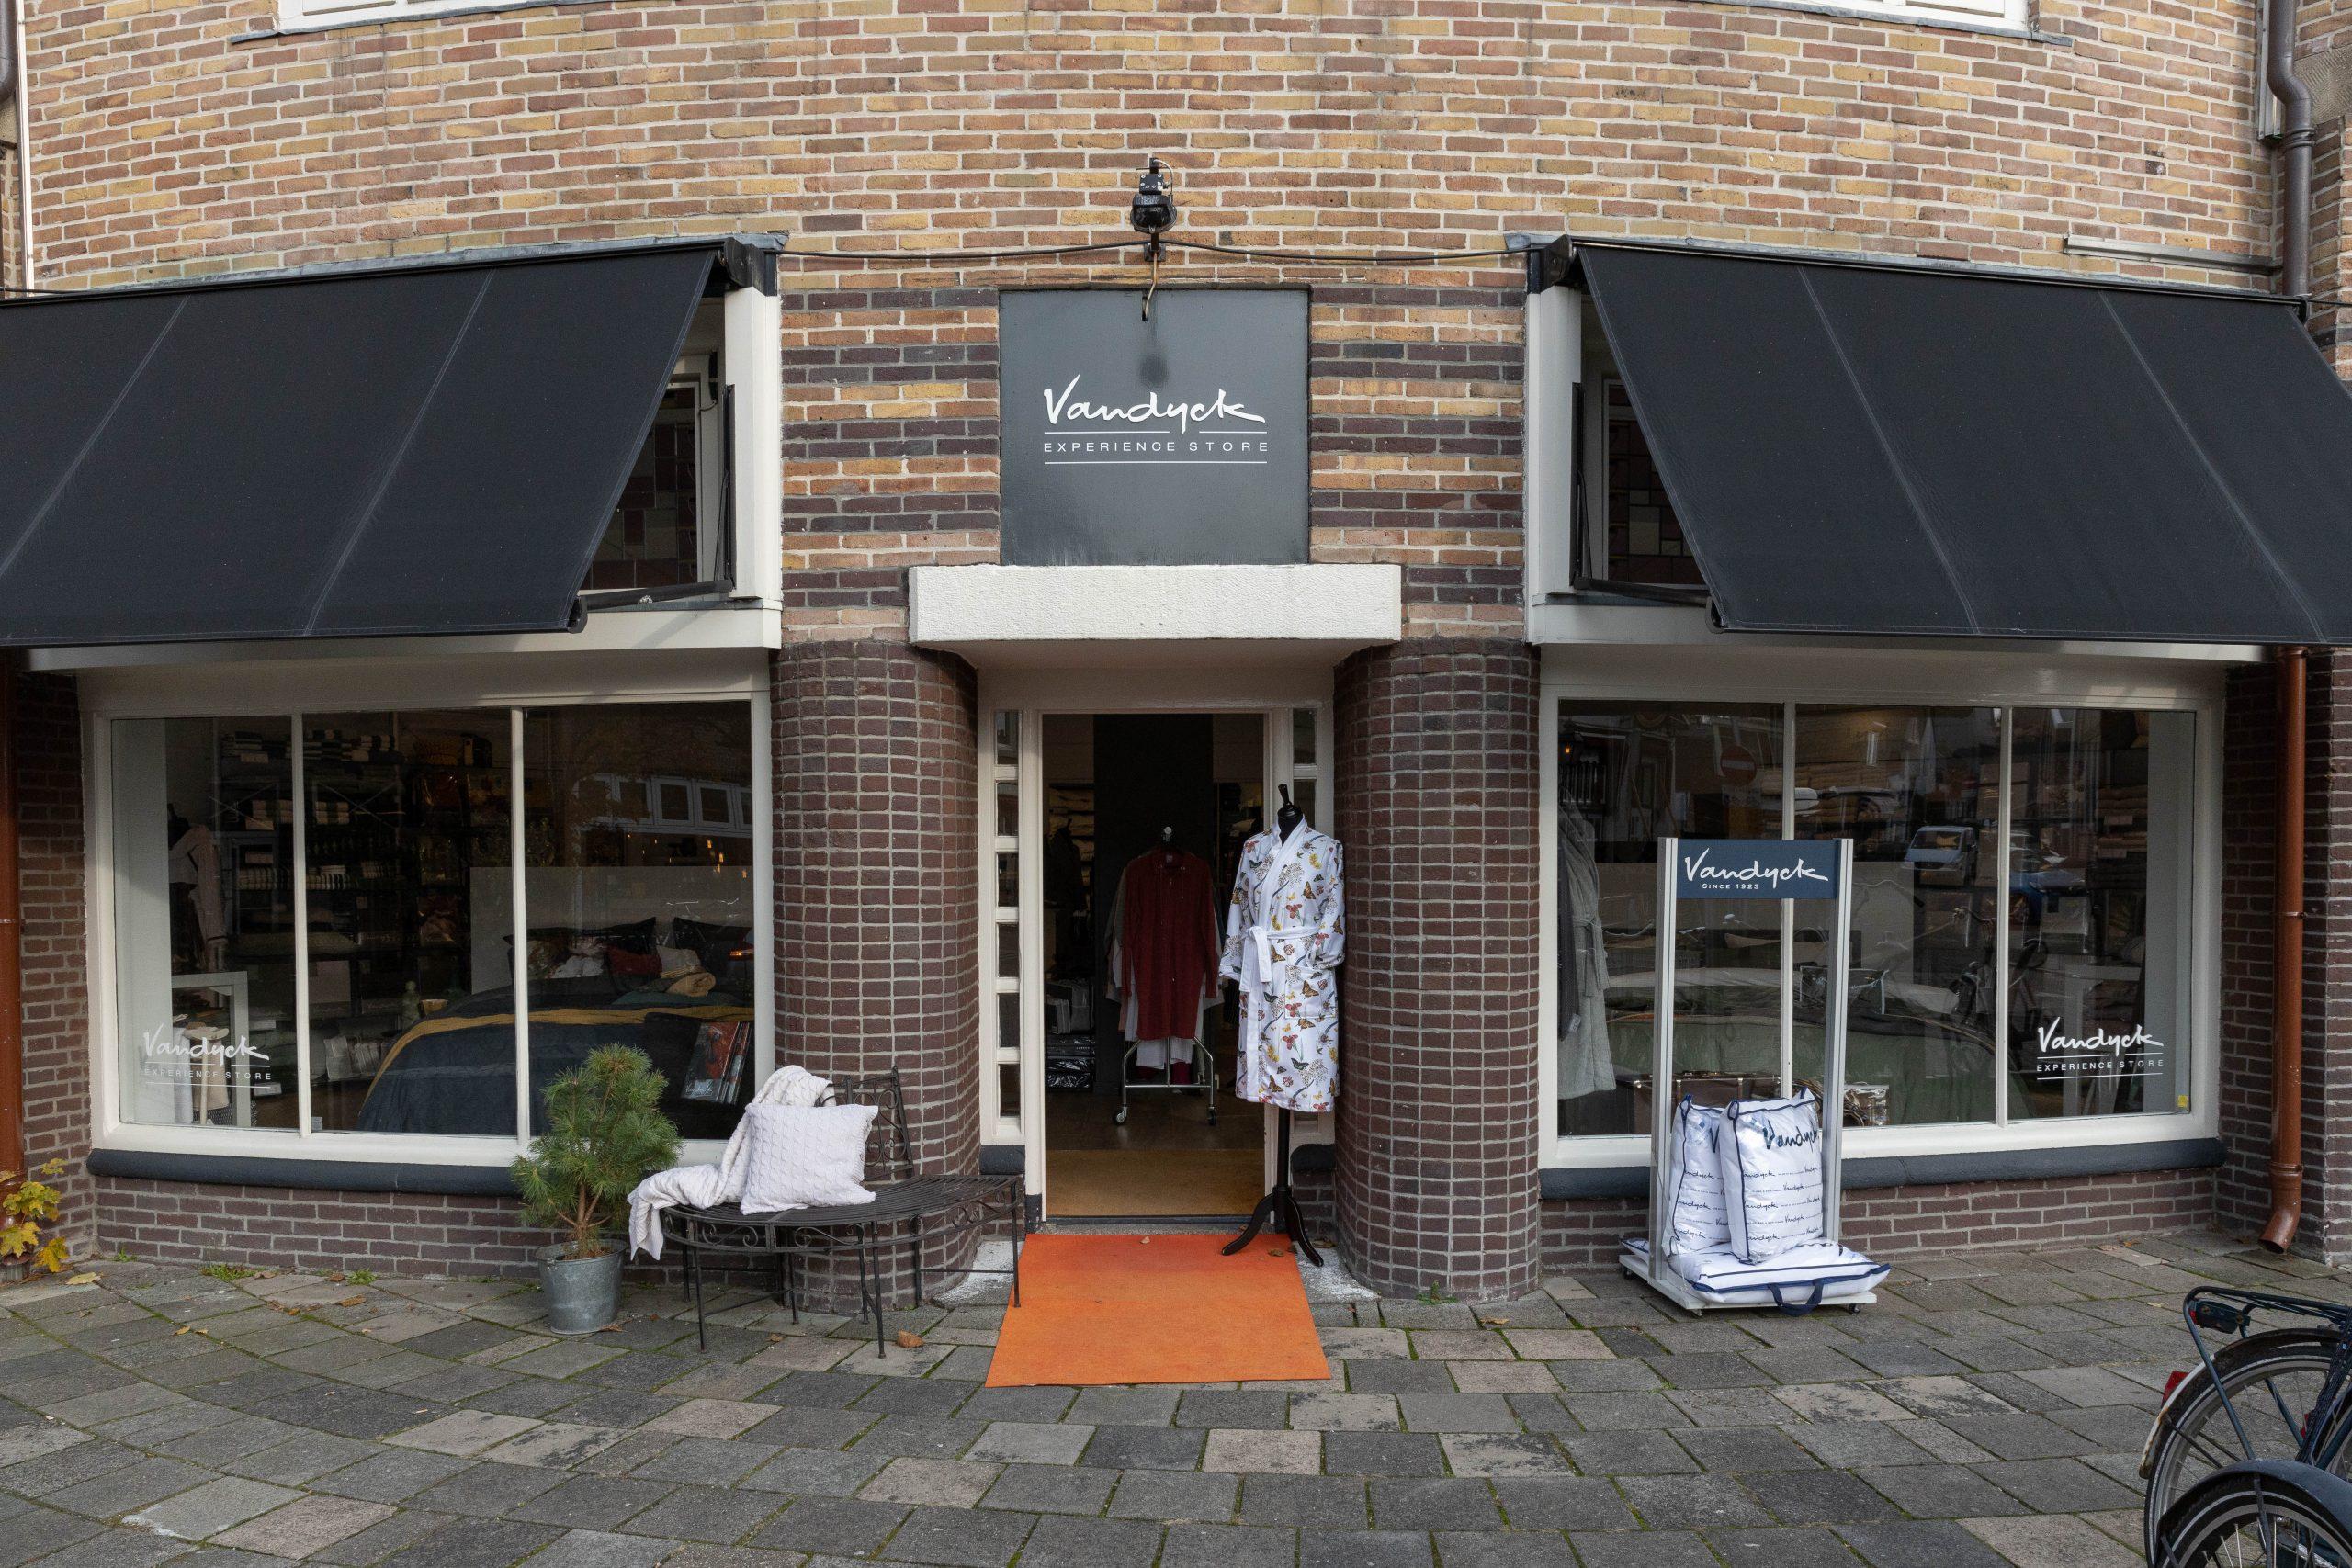 Van Dyck Experience Store